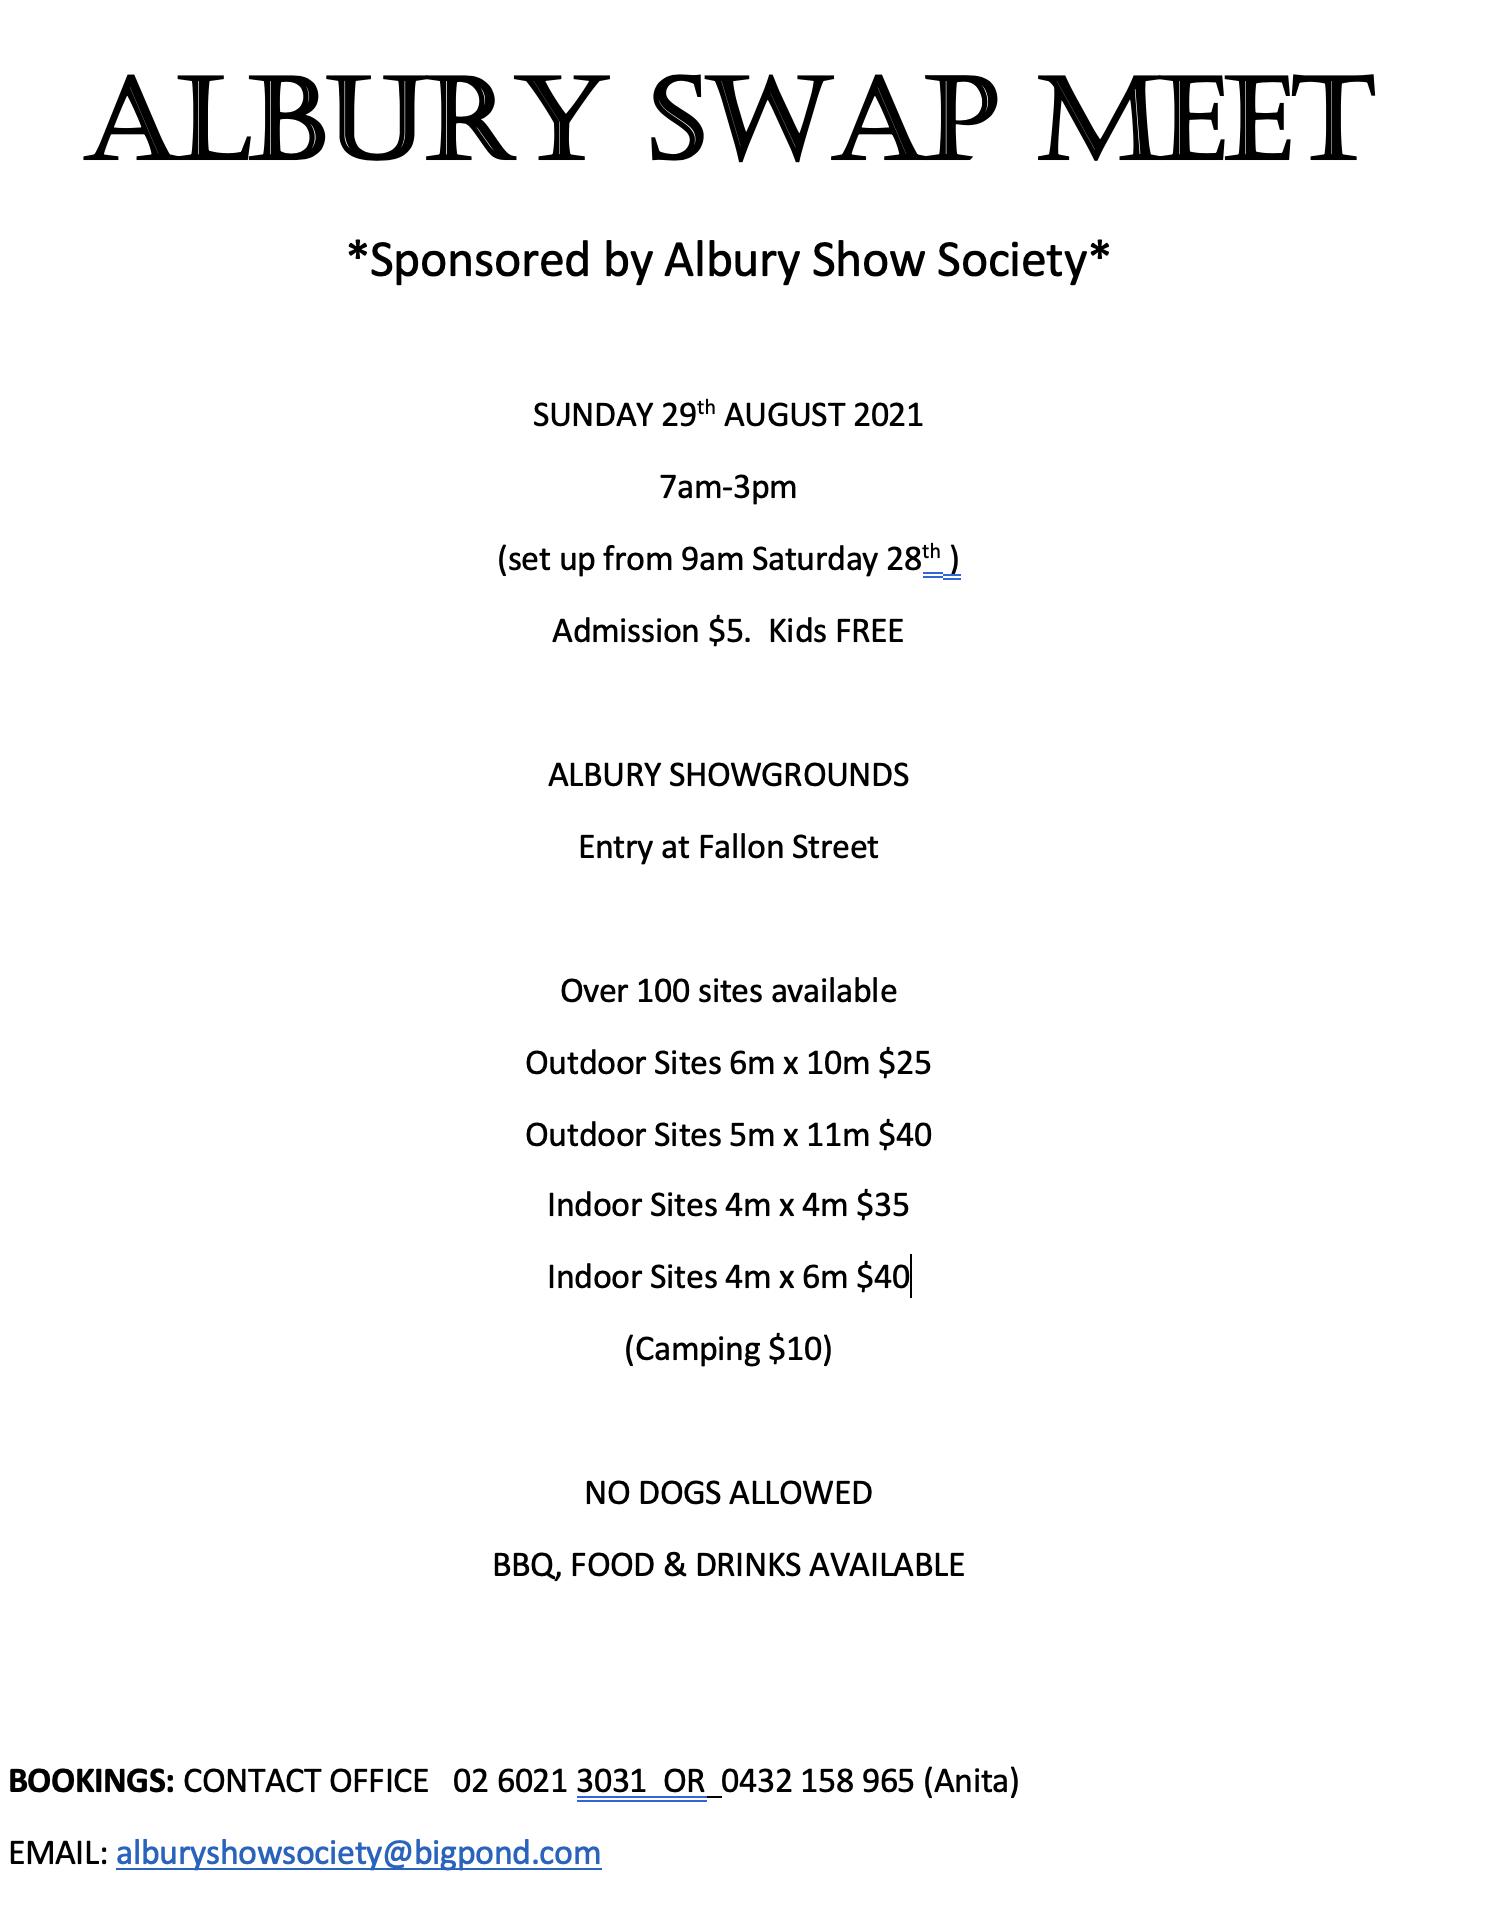 Albury Swap Meet 2021 @ Swap Meet Albury Show Grounds | North Albury | New South Wales | Australia